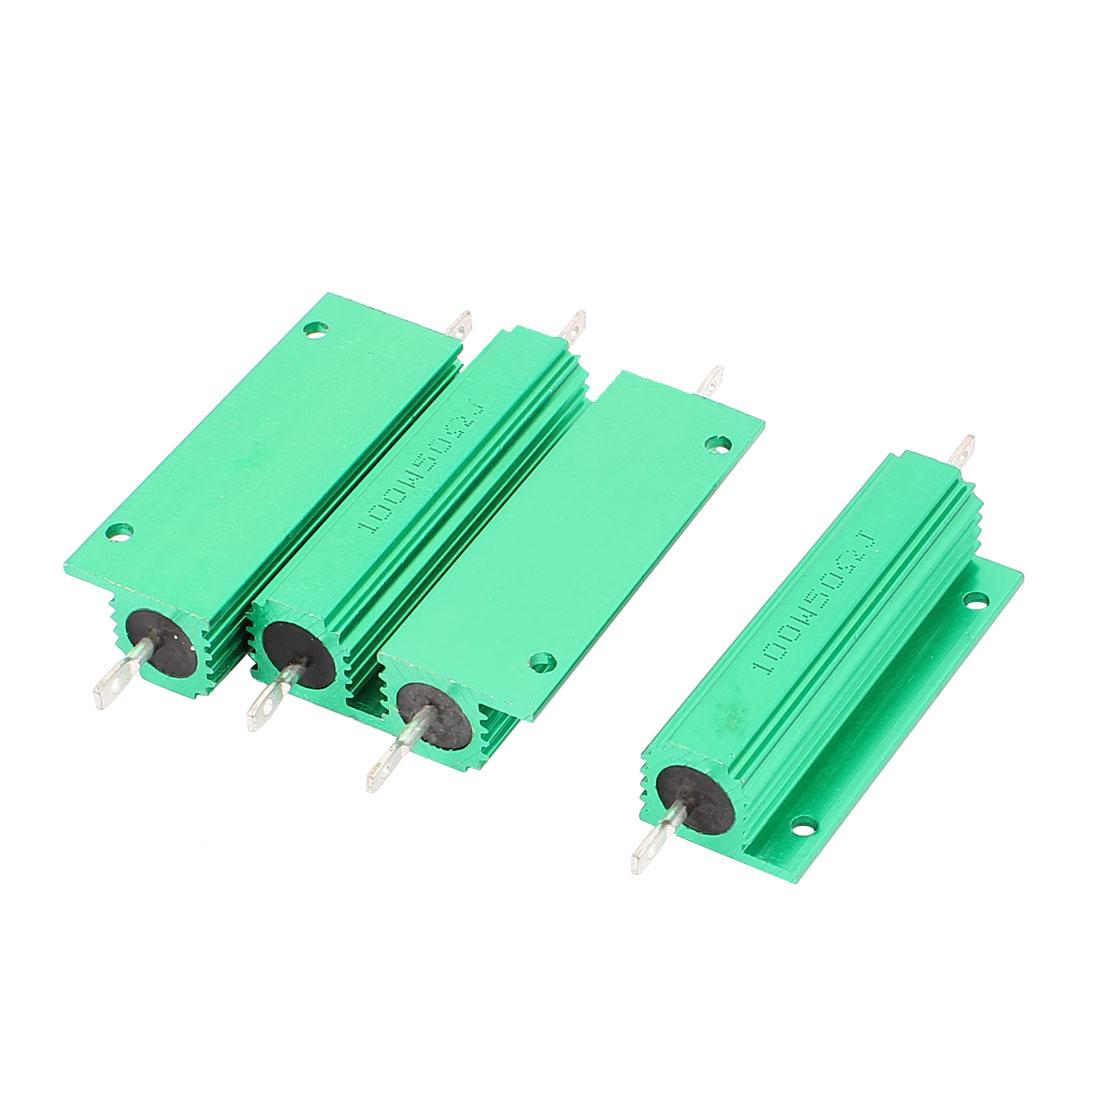 4Pcs Aluminum Housed 100W Watt 50 Ohm 5% Tolerance Fixed Resistor Green